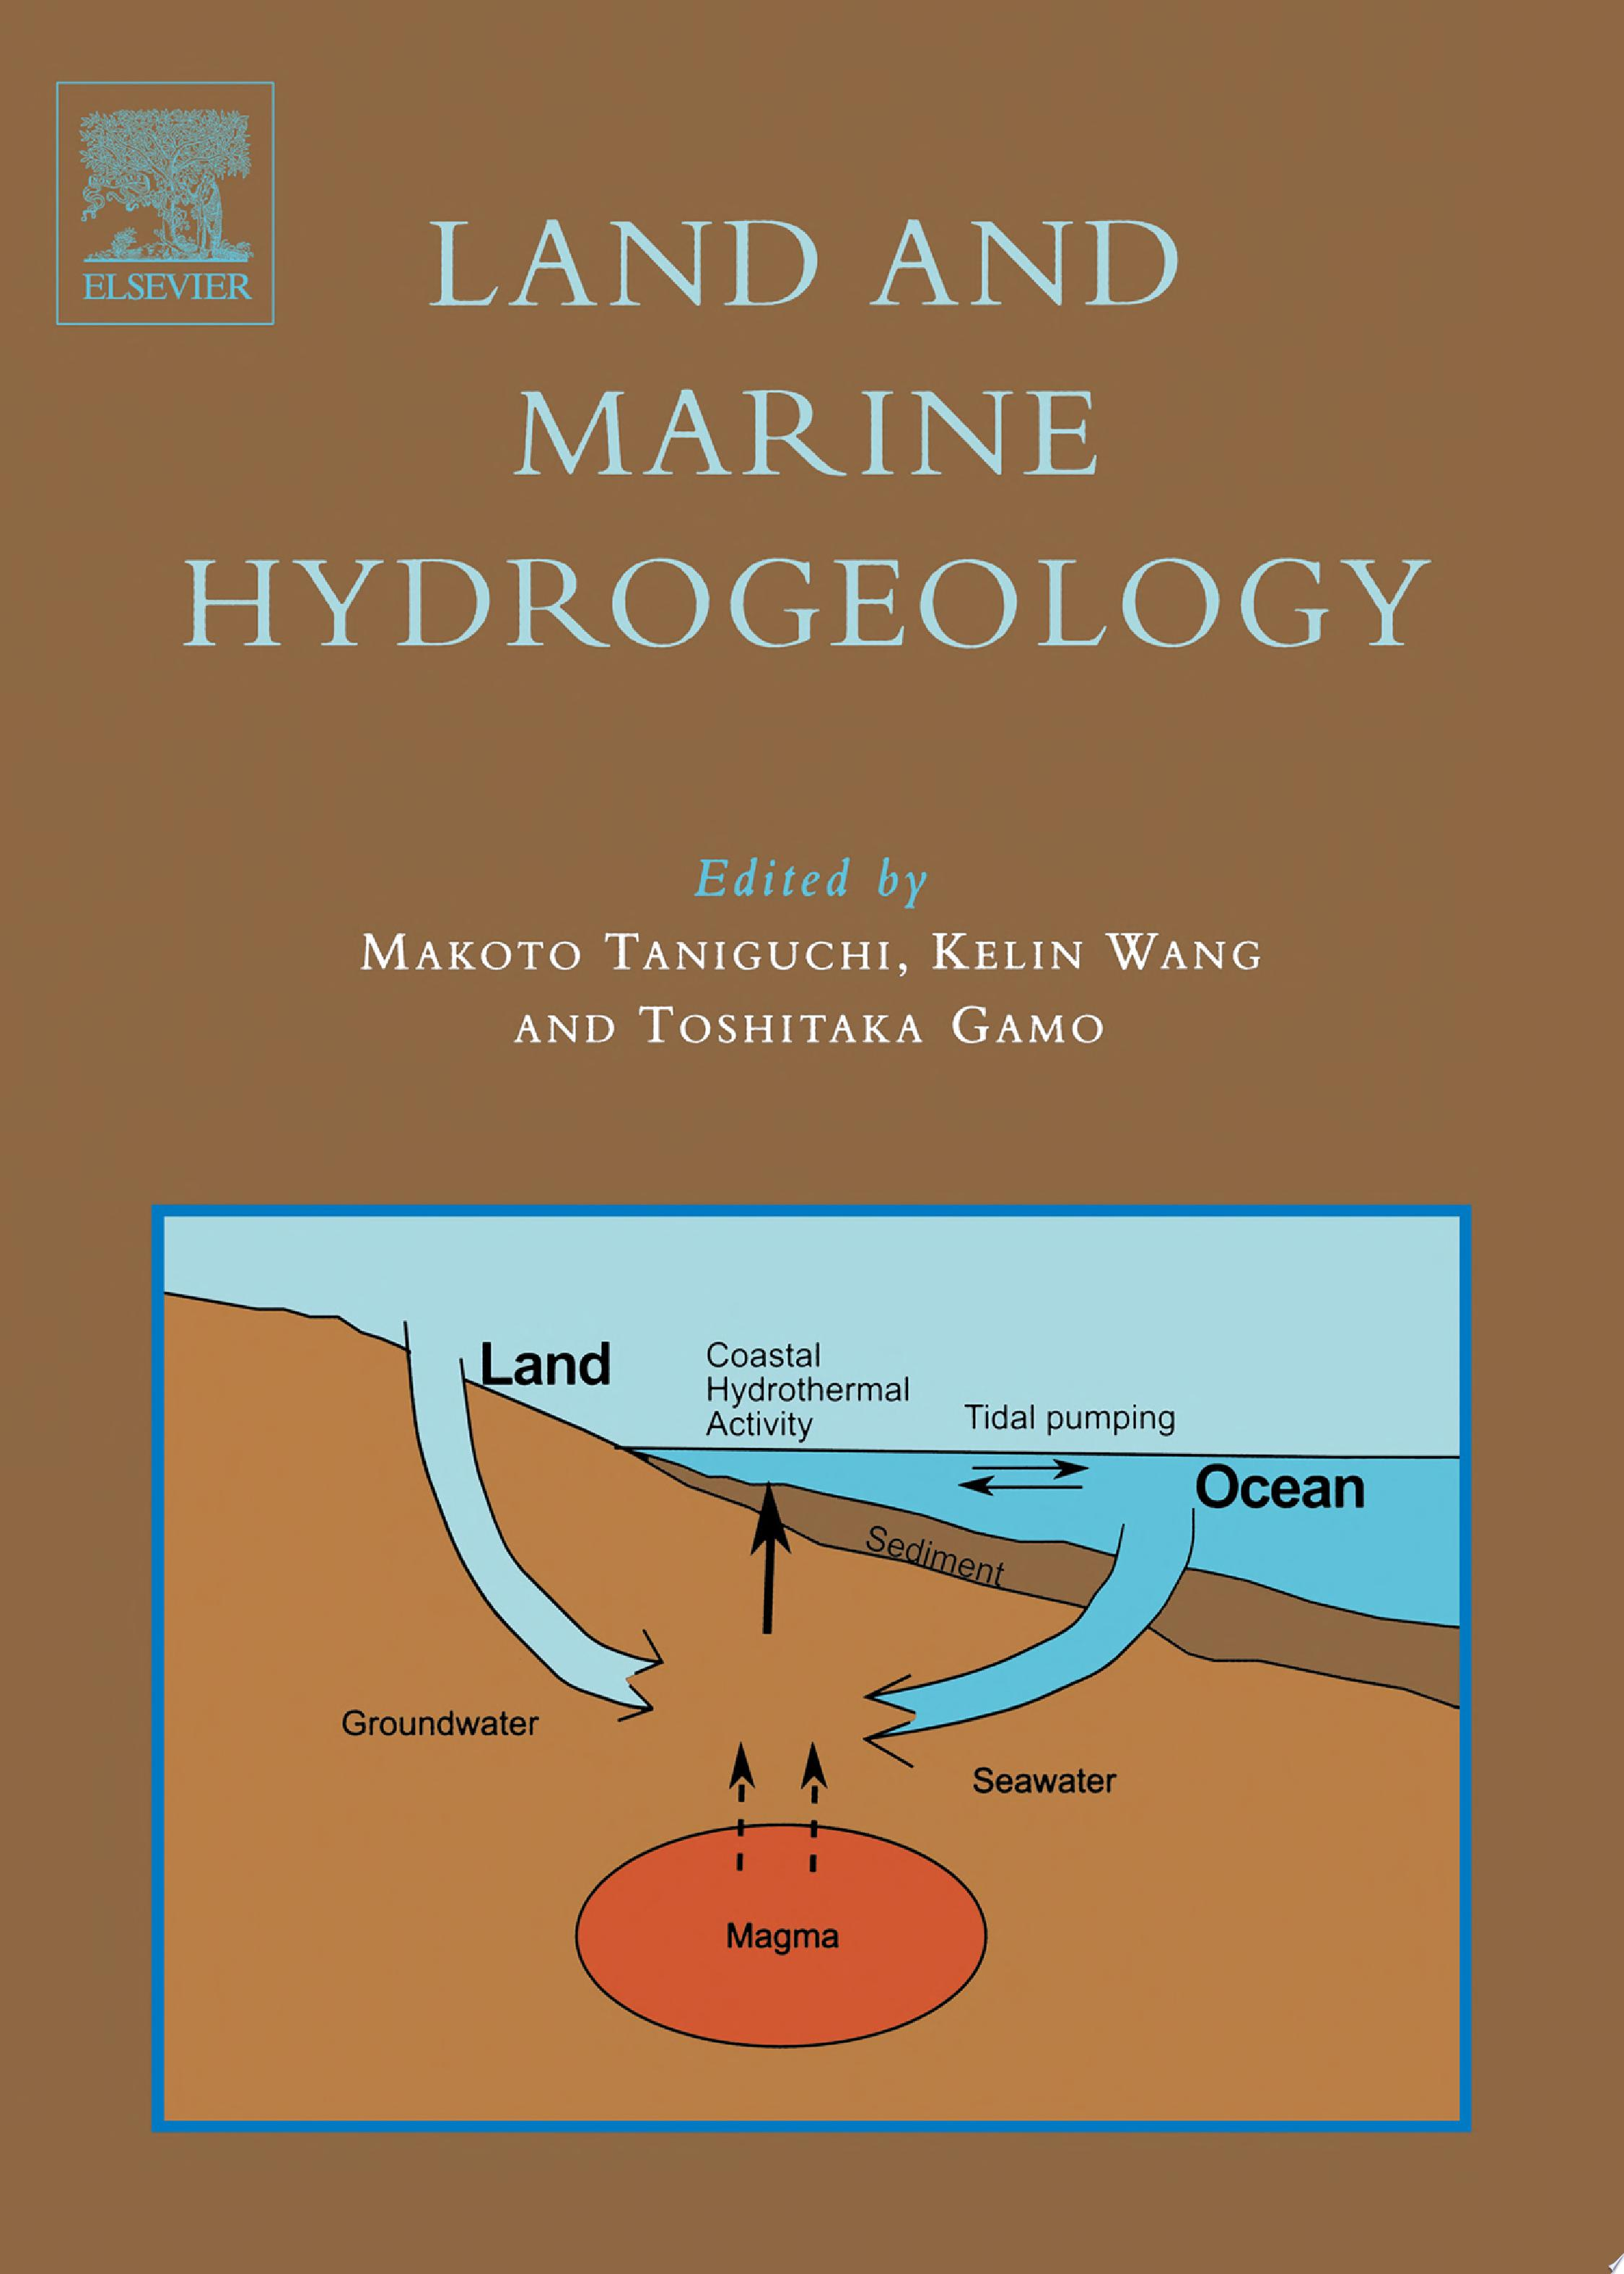 Land and Marine Hydrogeology